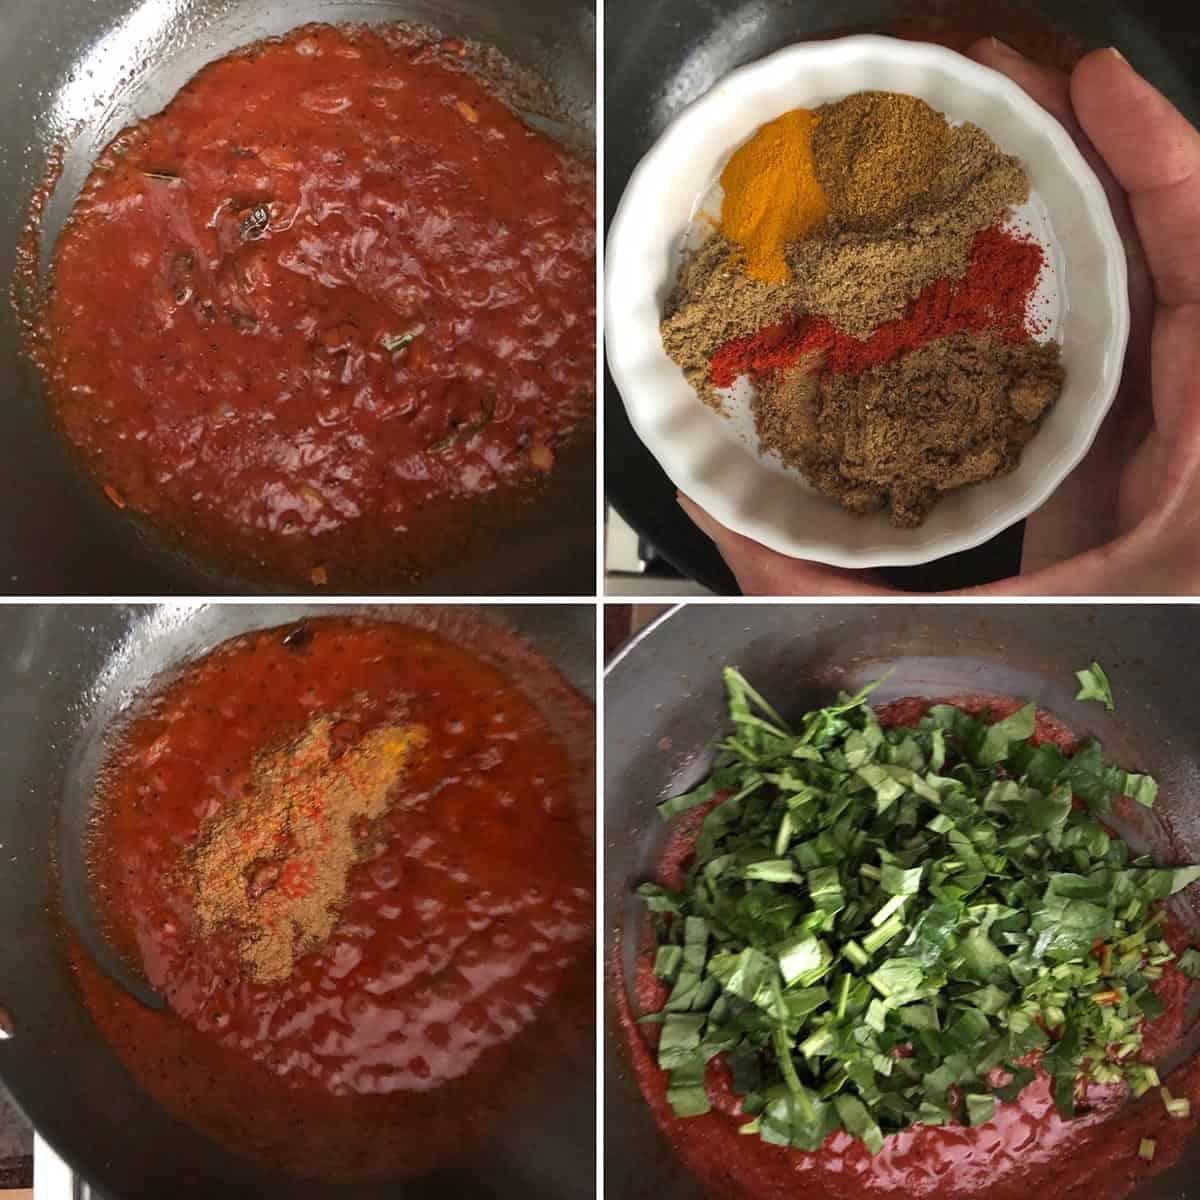 Adding tomato puree, spices and spinach